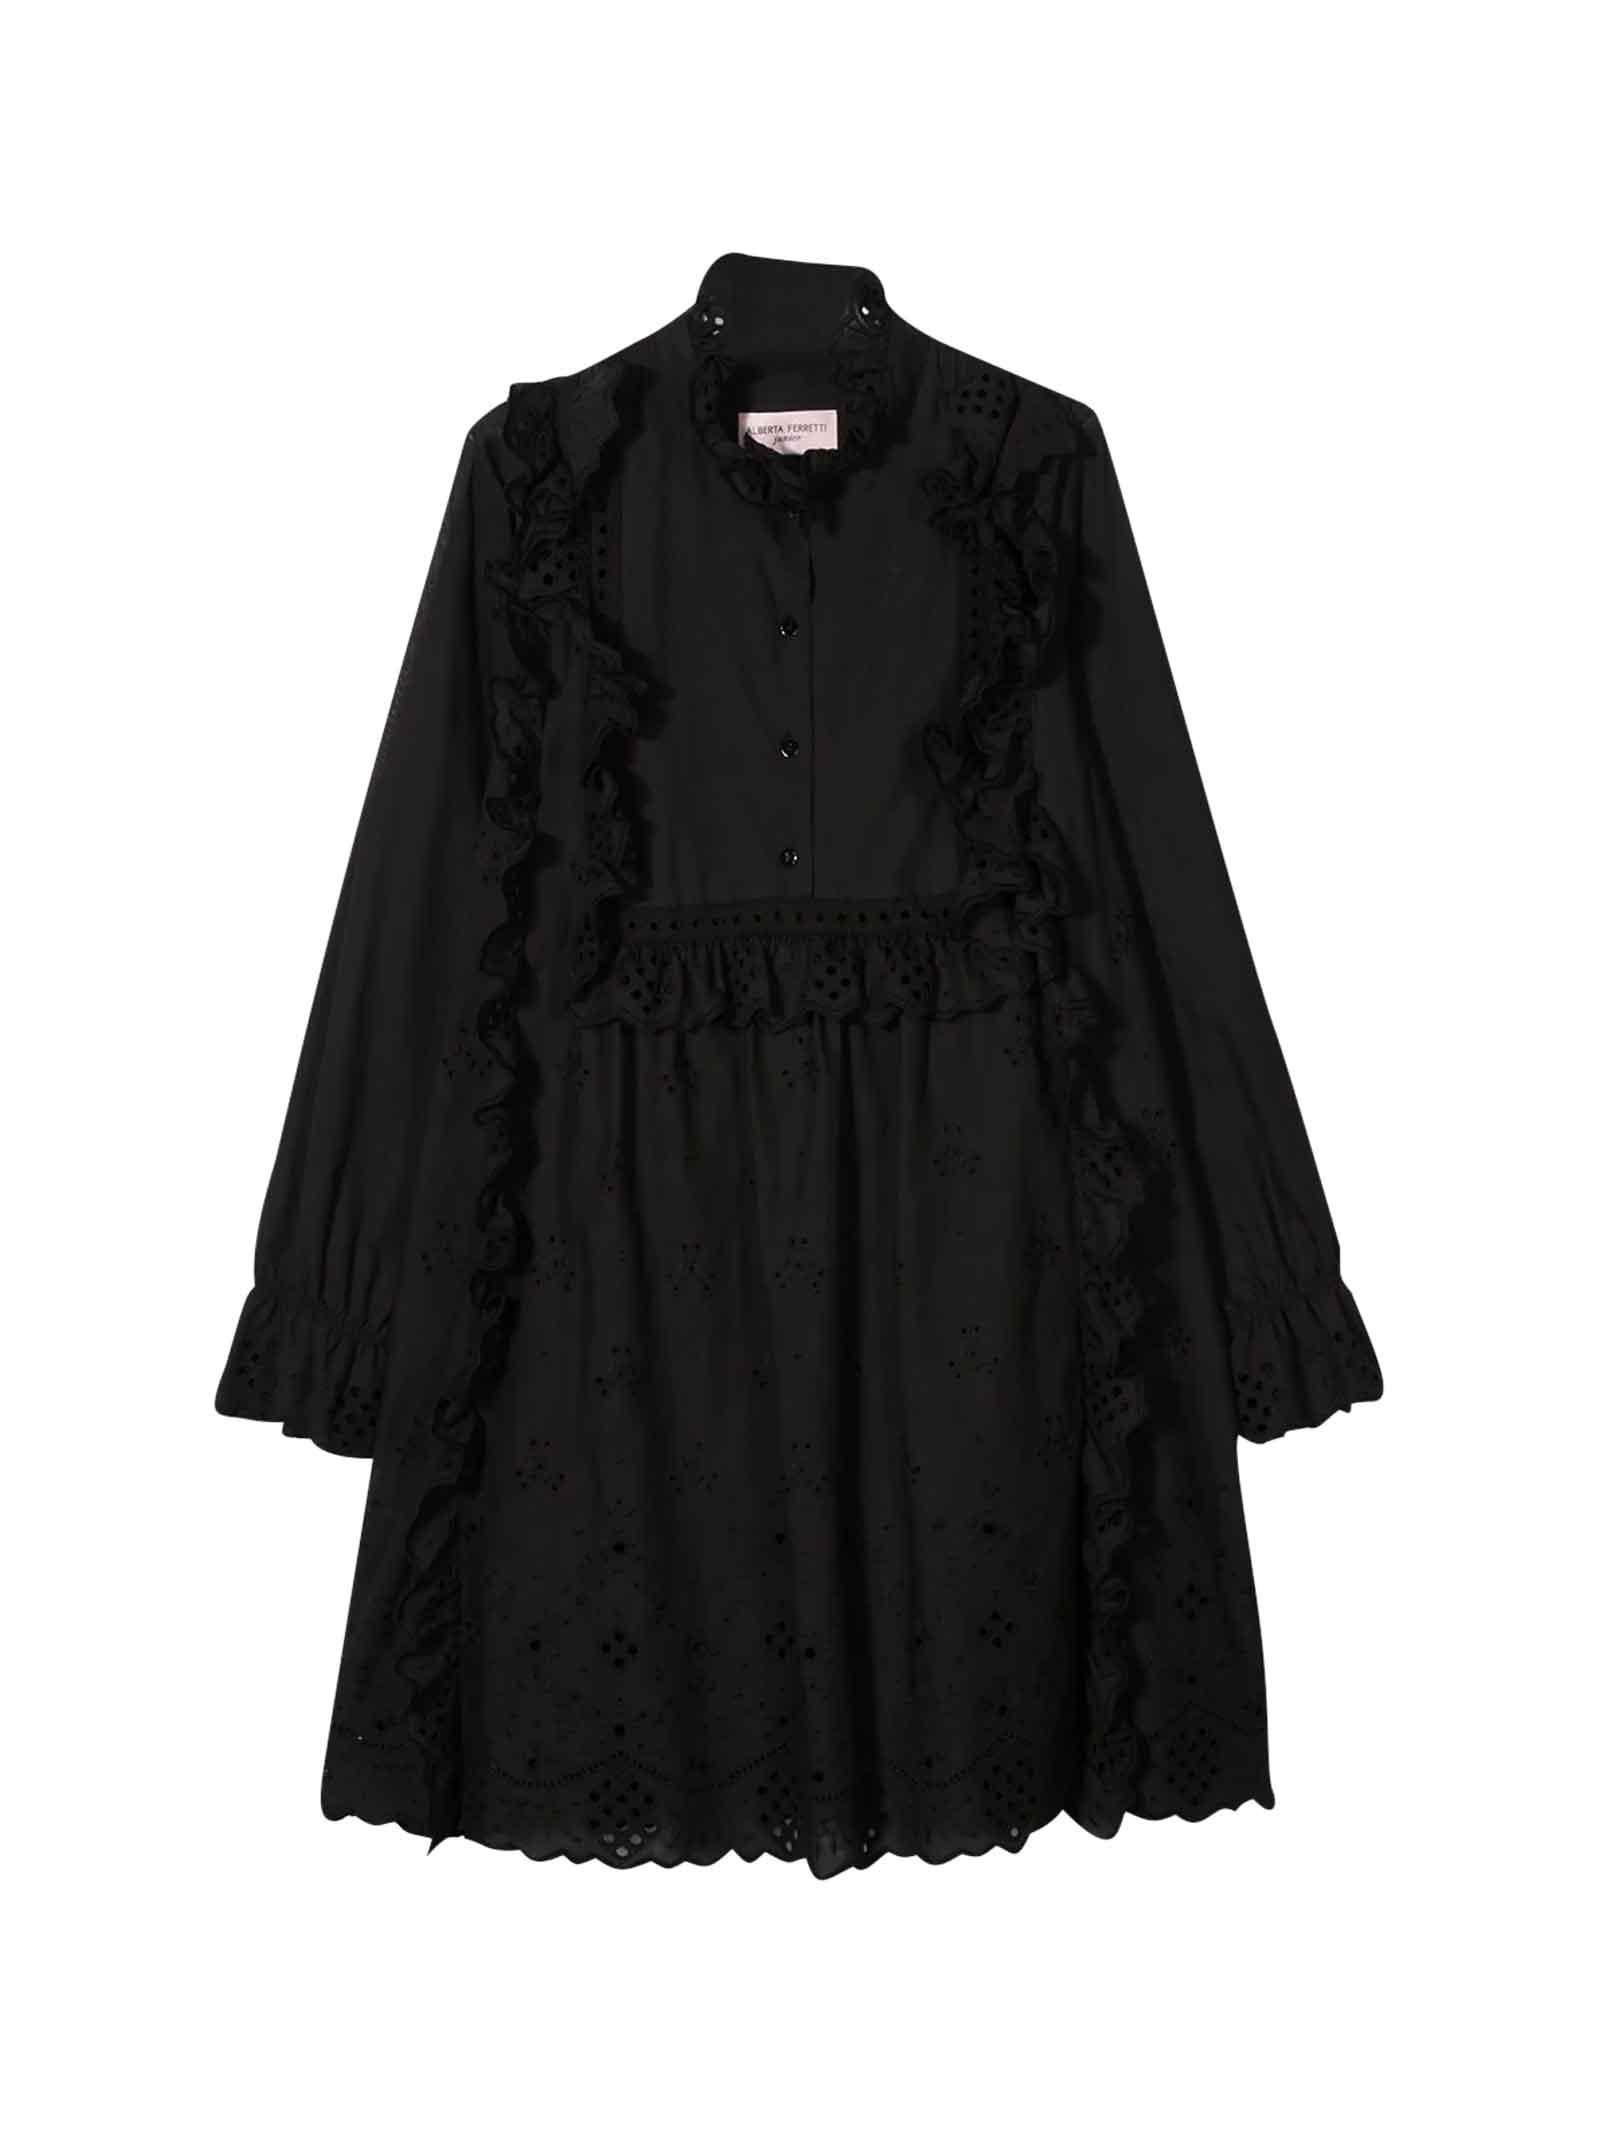 Buy Alberta Ferretti Black Teen Dress With Decorative Flowers online, shop Alberta Ferretti with free shipping